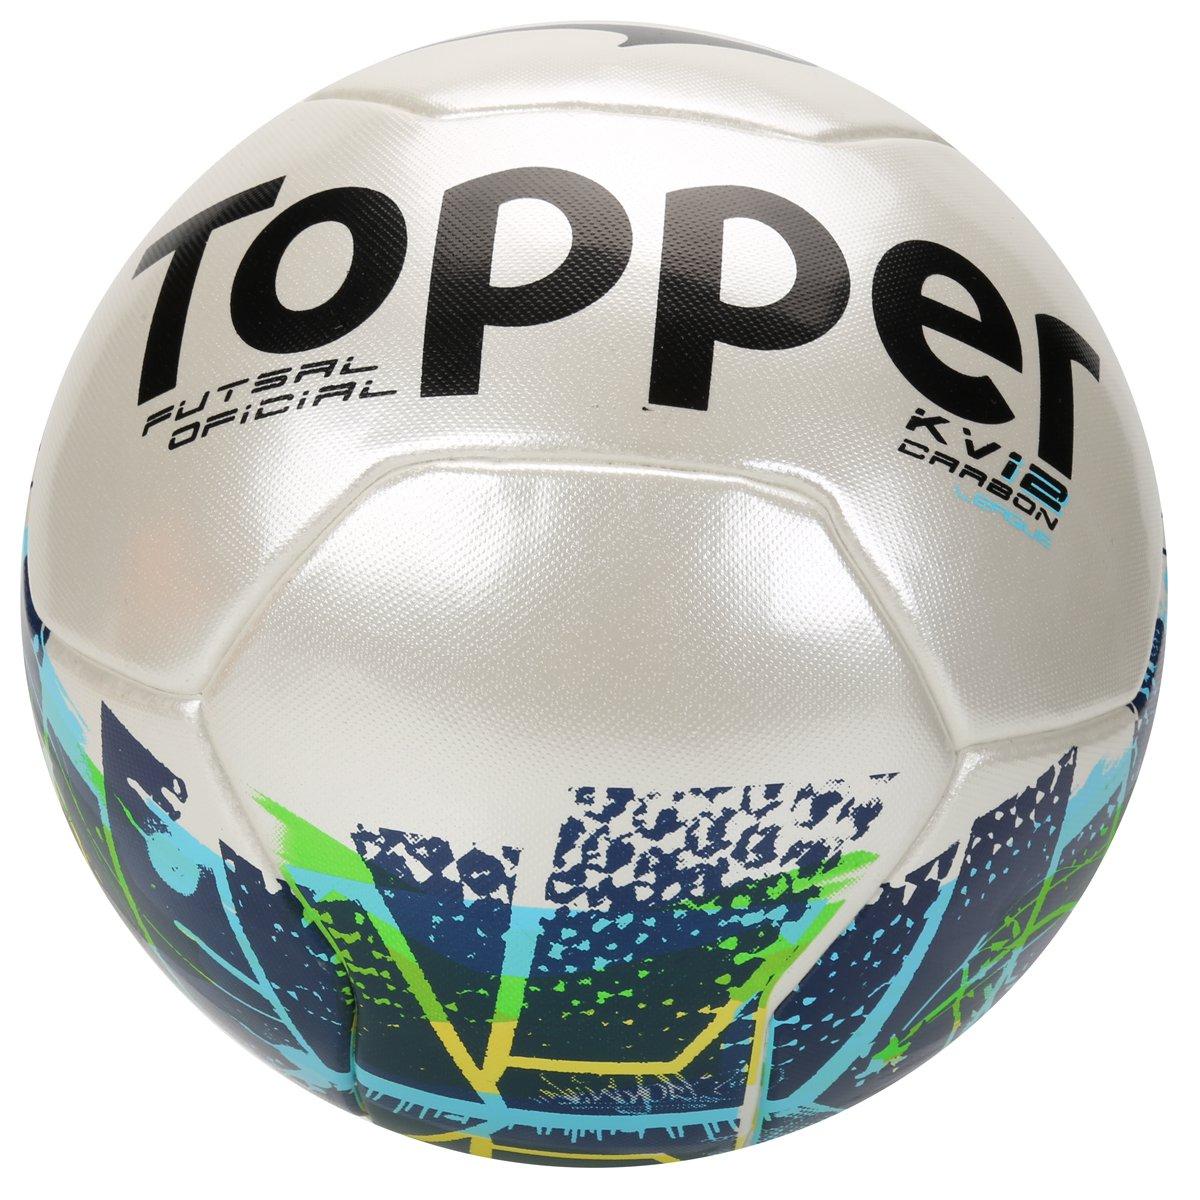 Bola Futsal Topper KV Carbon League 2 - Compre Agora  994fcfae28355